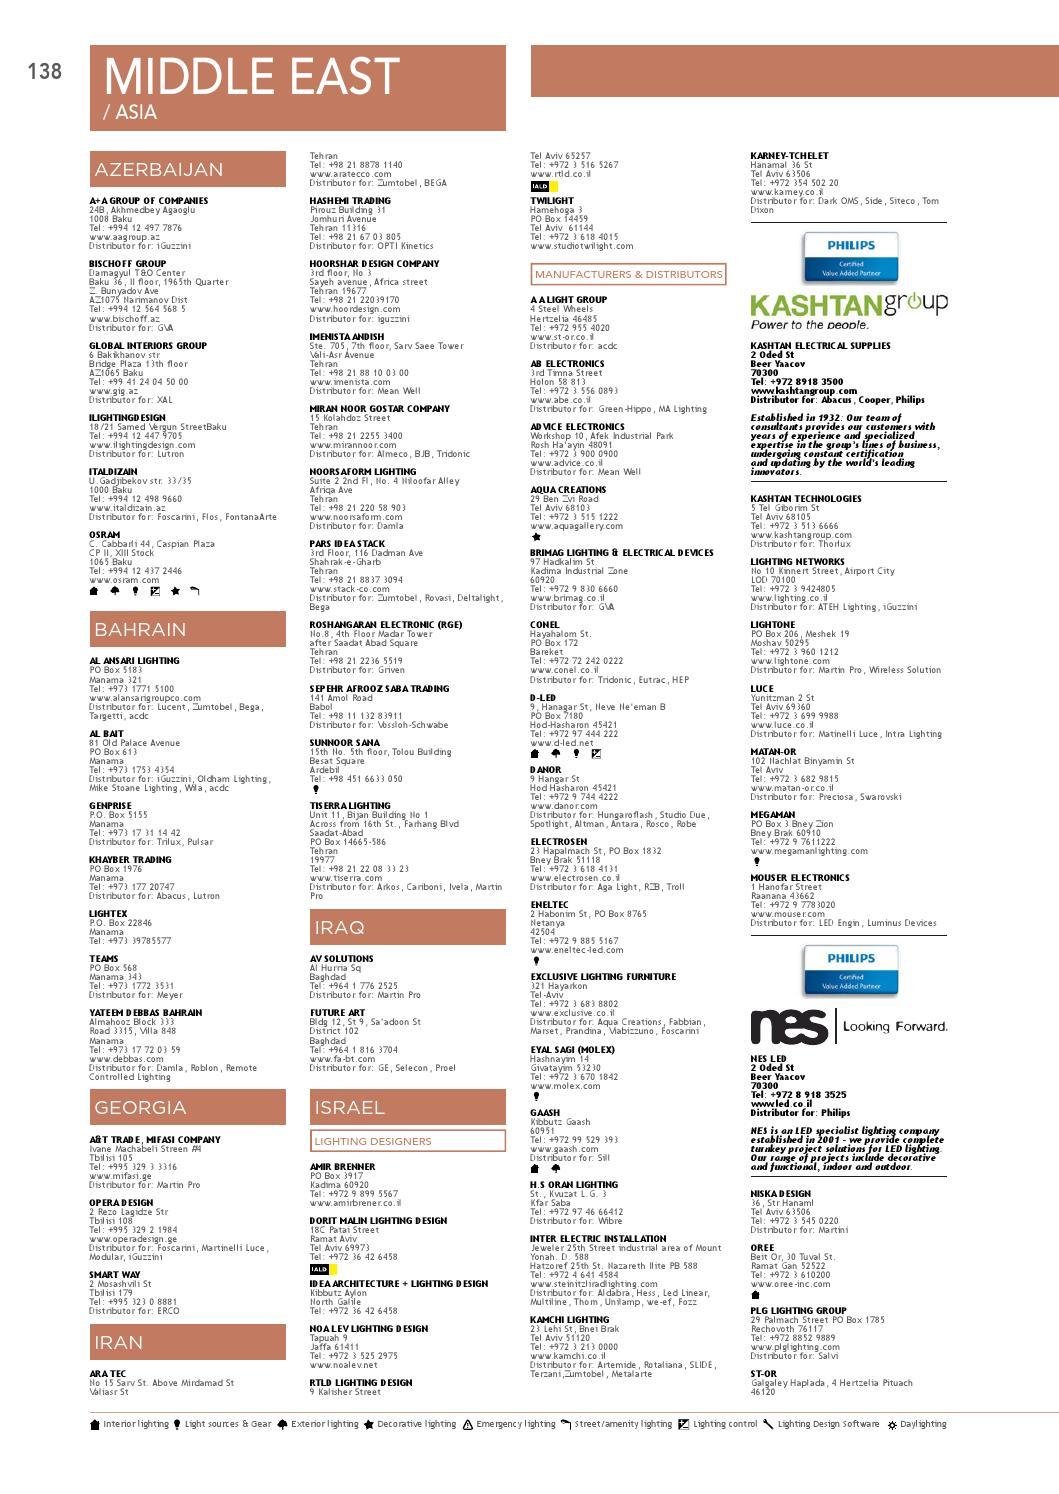 ILDS 2015 by Mondiale Media issuu